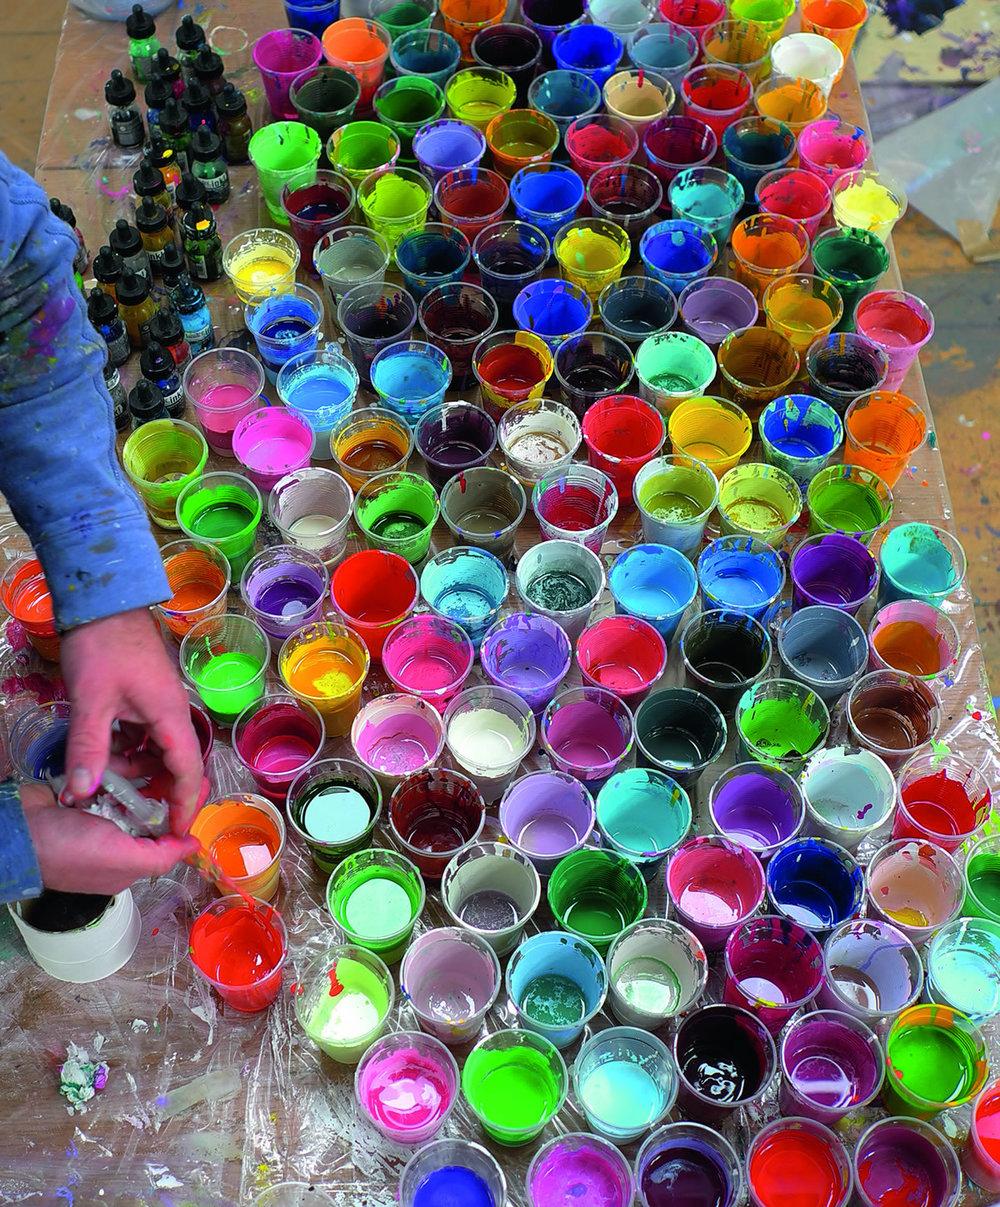 BB16_Ian_Davenport_at_FloreArtGallery_The_artist_at work_2013_credit_Sue_Arrowsmith.jpg